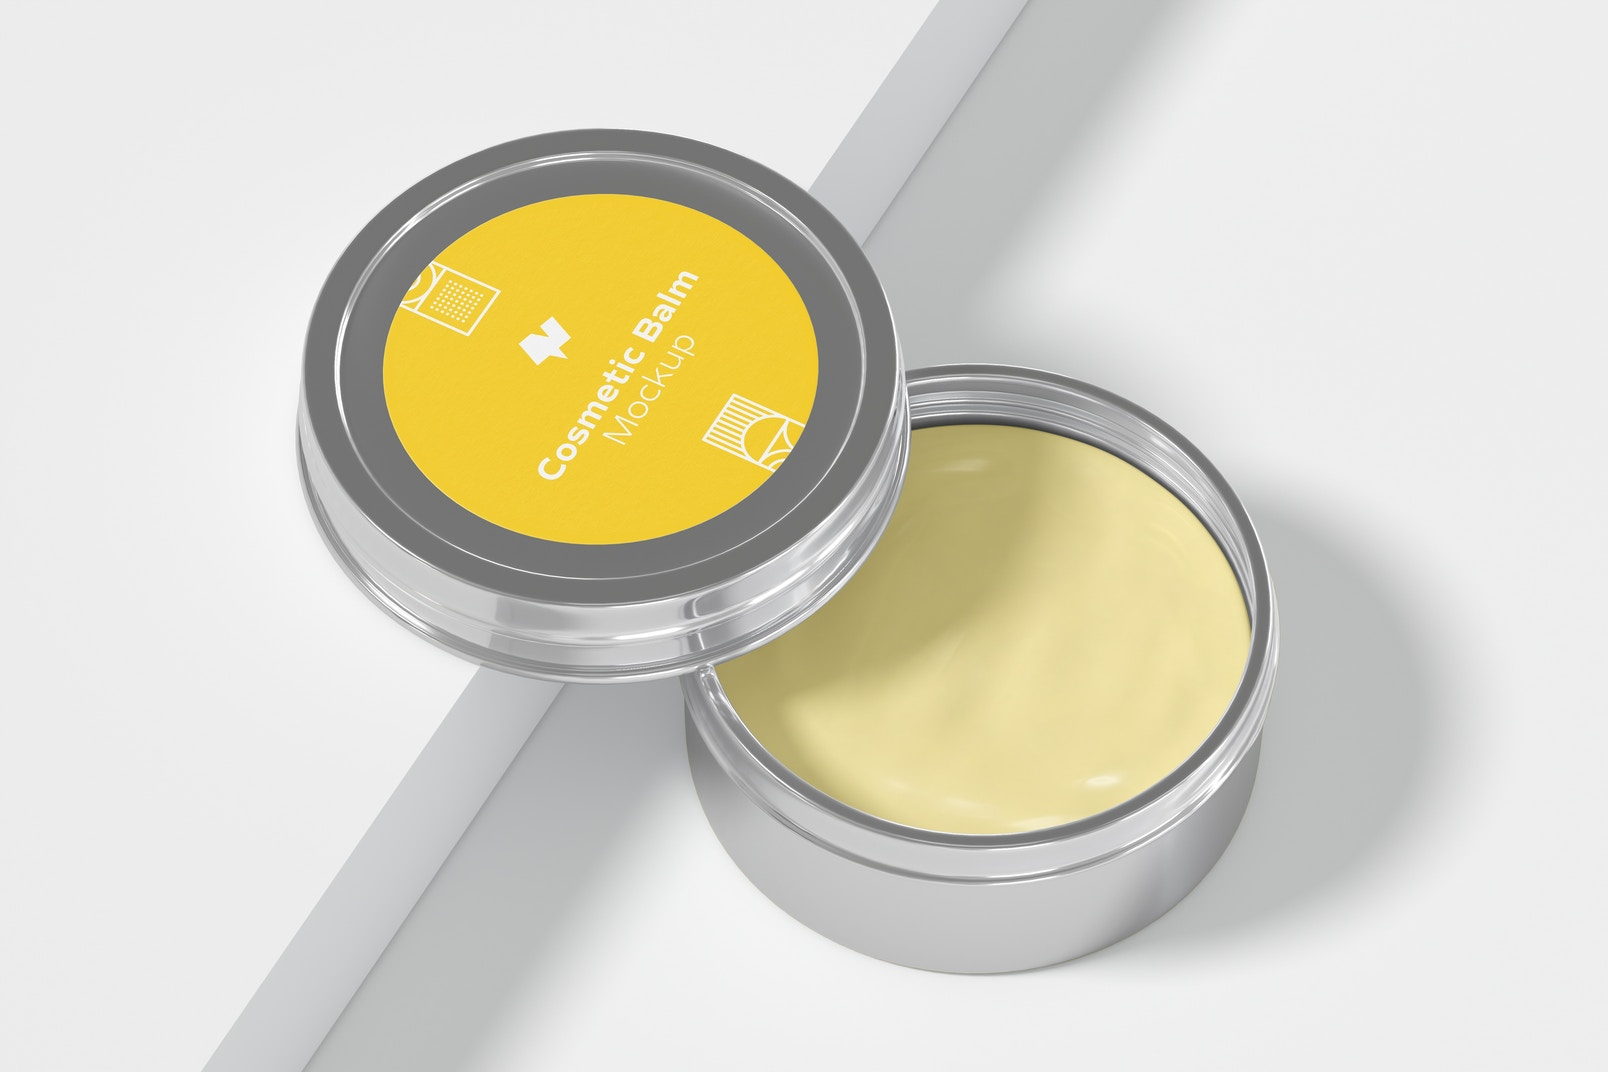 Metallic Cosmetic Balm Packaging Mockup, Open